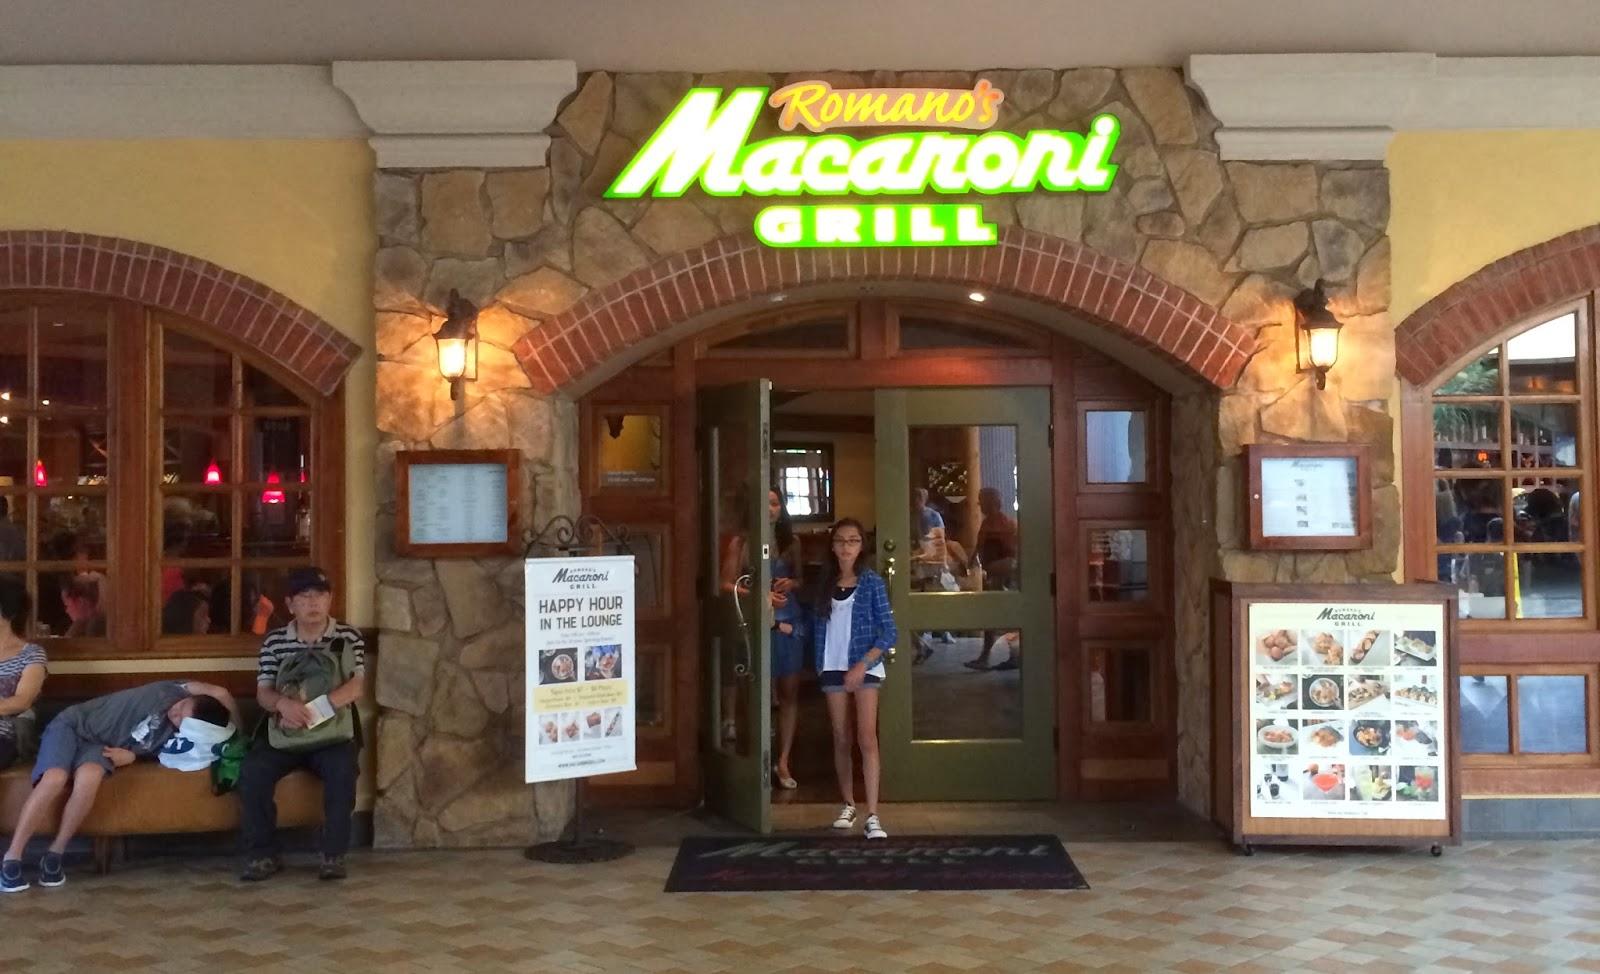 TASTE OF HAWAII: ROMANO\'S MACARONI GRILL